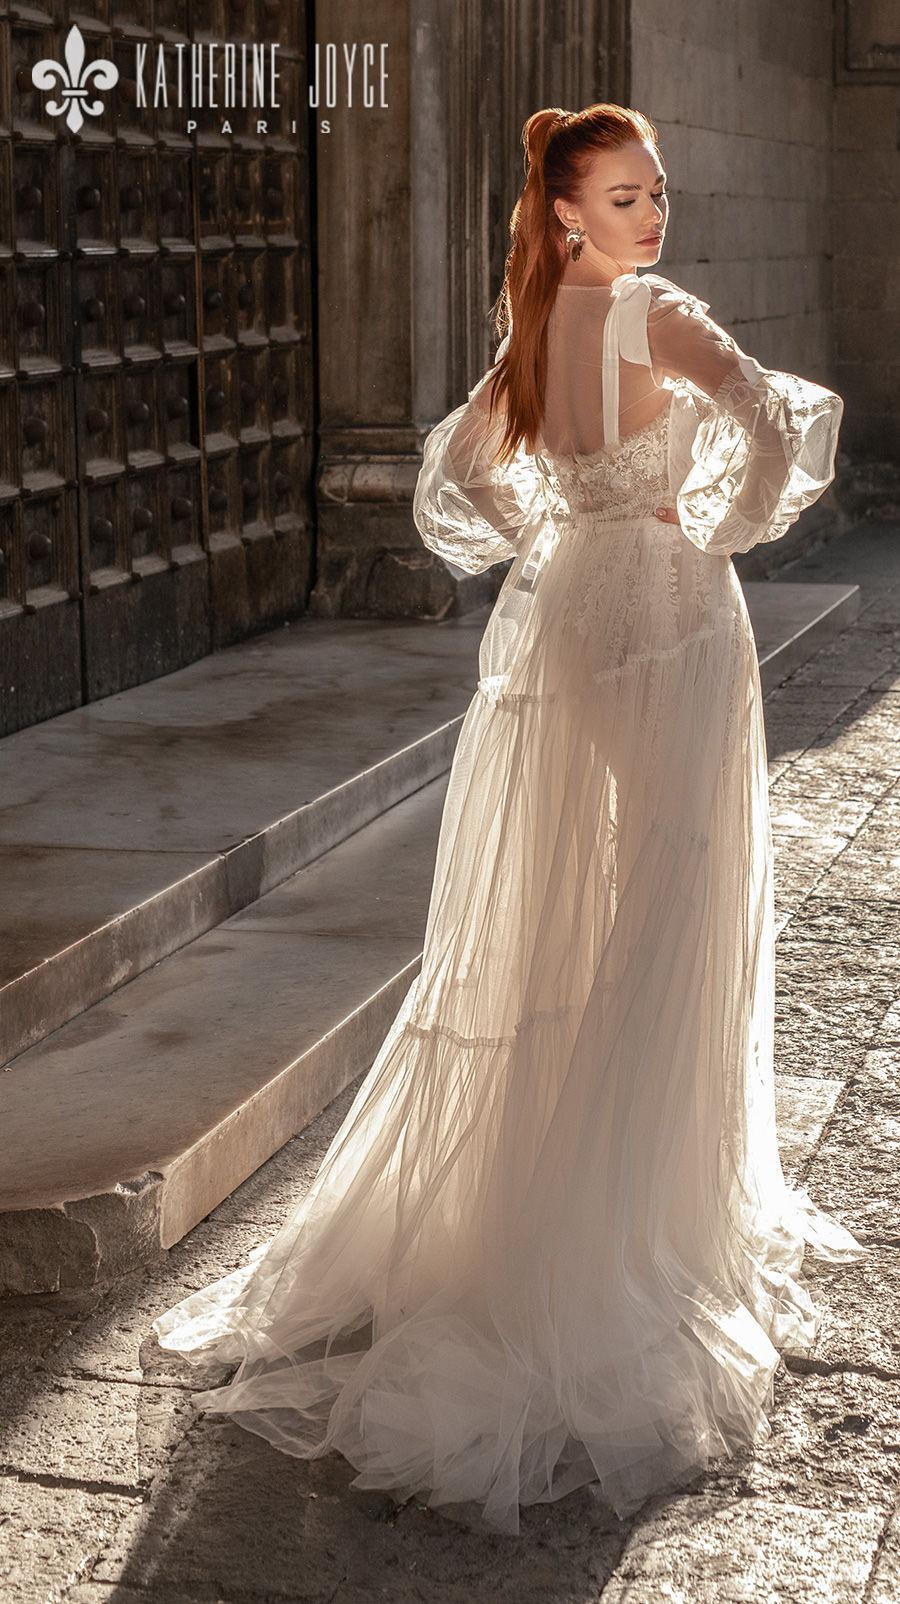 katherine joyce 2021 naples bridal long bishop sleeves ribbon straps sweetheart neckline heavy embellished bodice tulle skirt romantic a line wedding dress mid back medium train (camila) bv